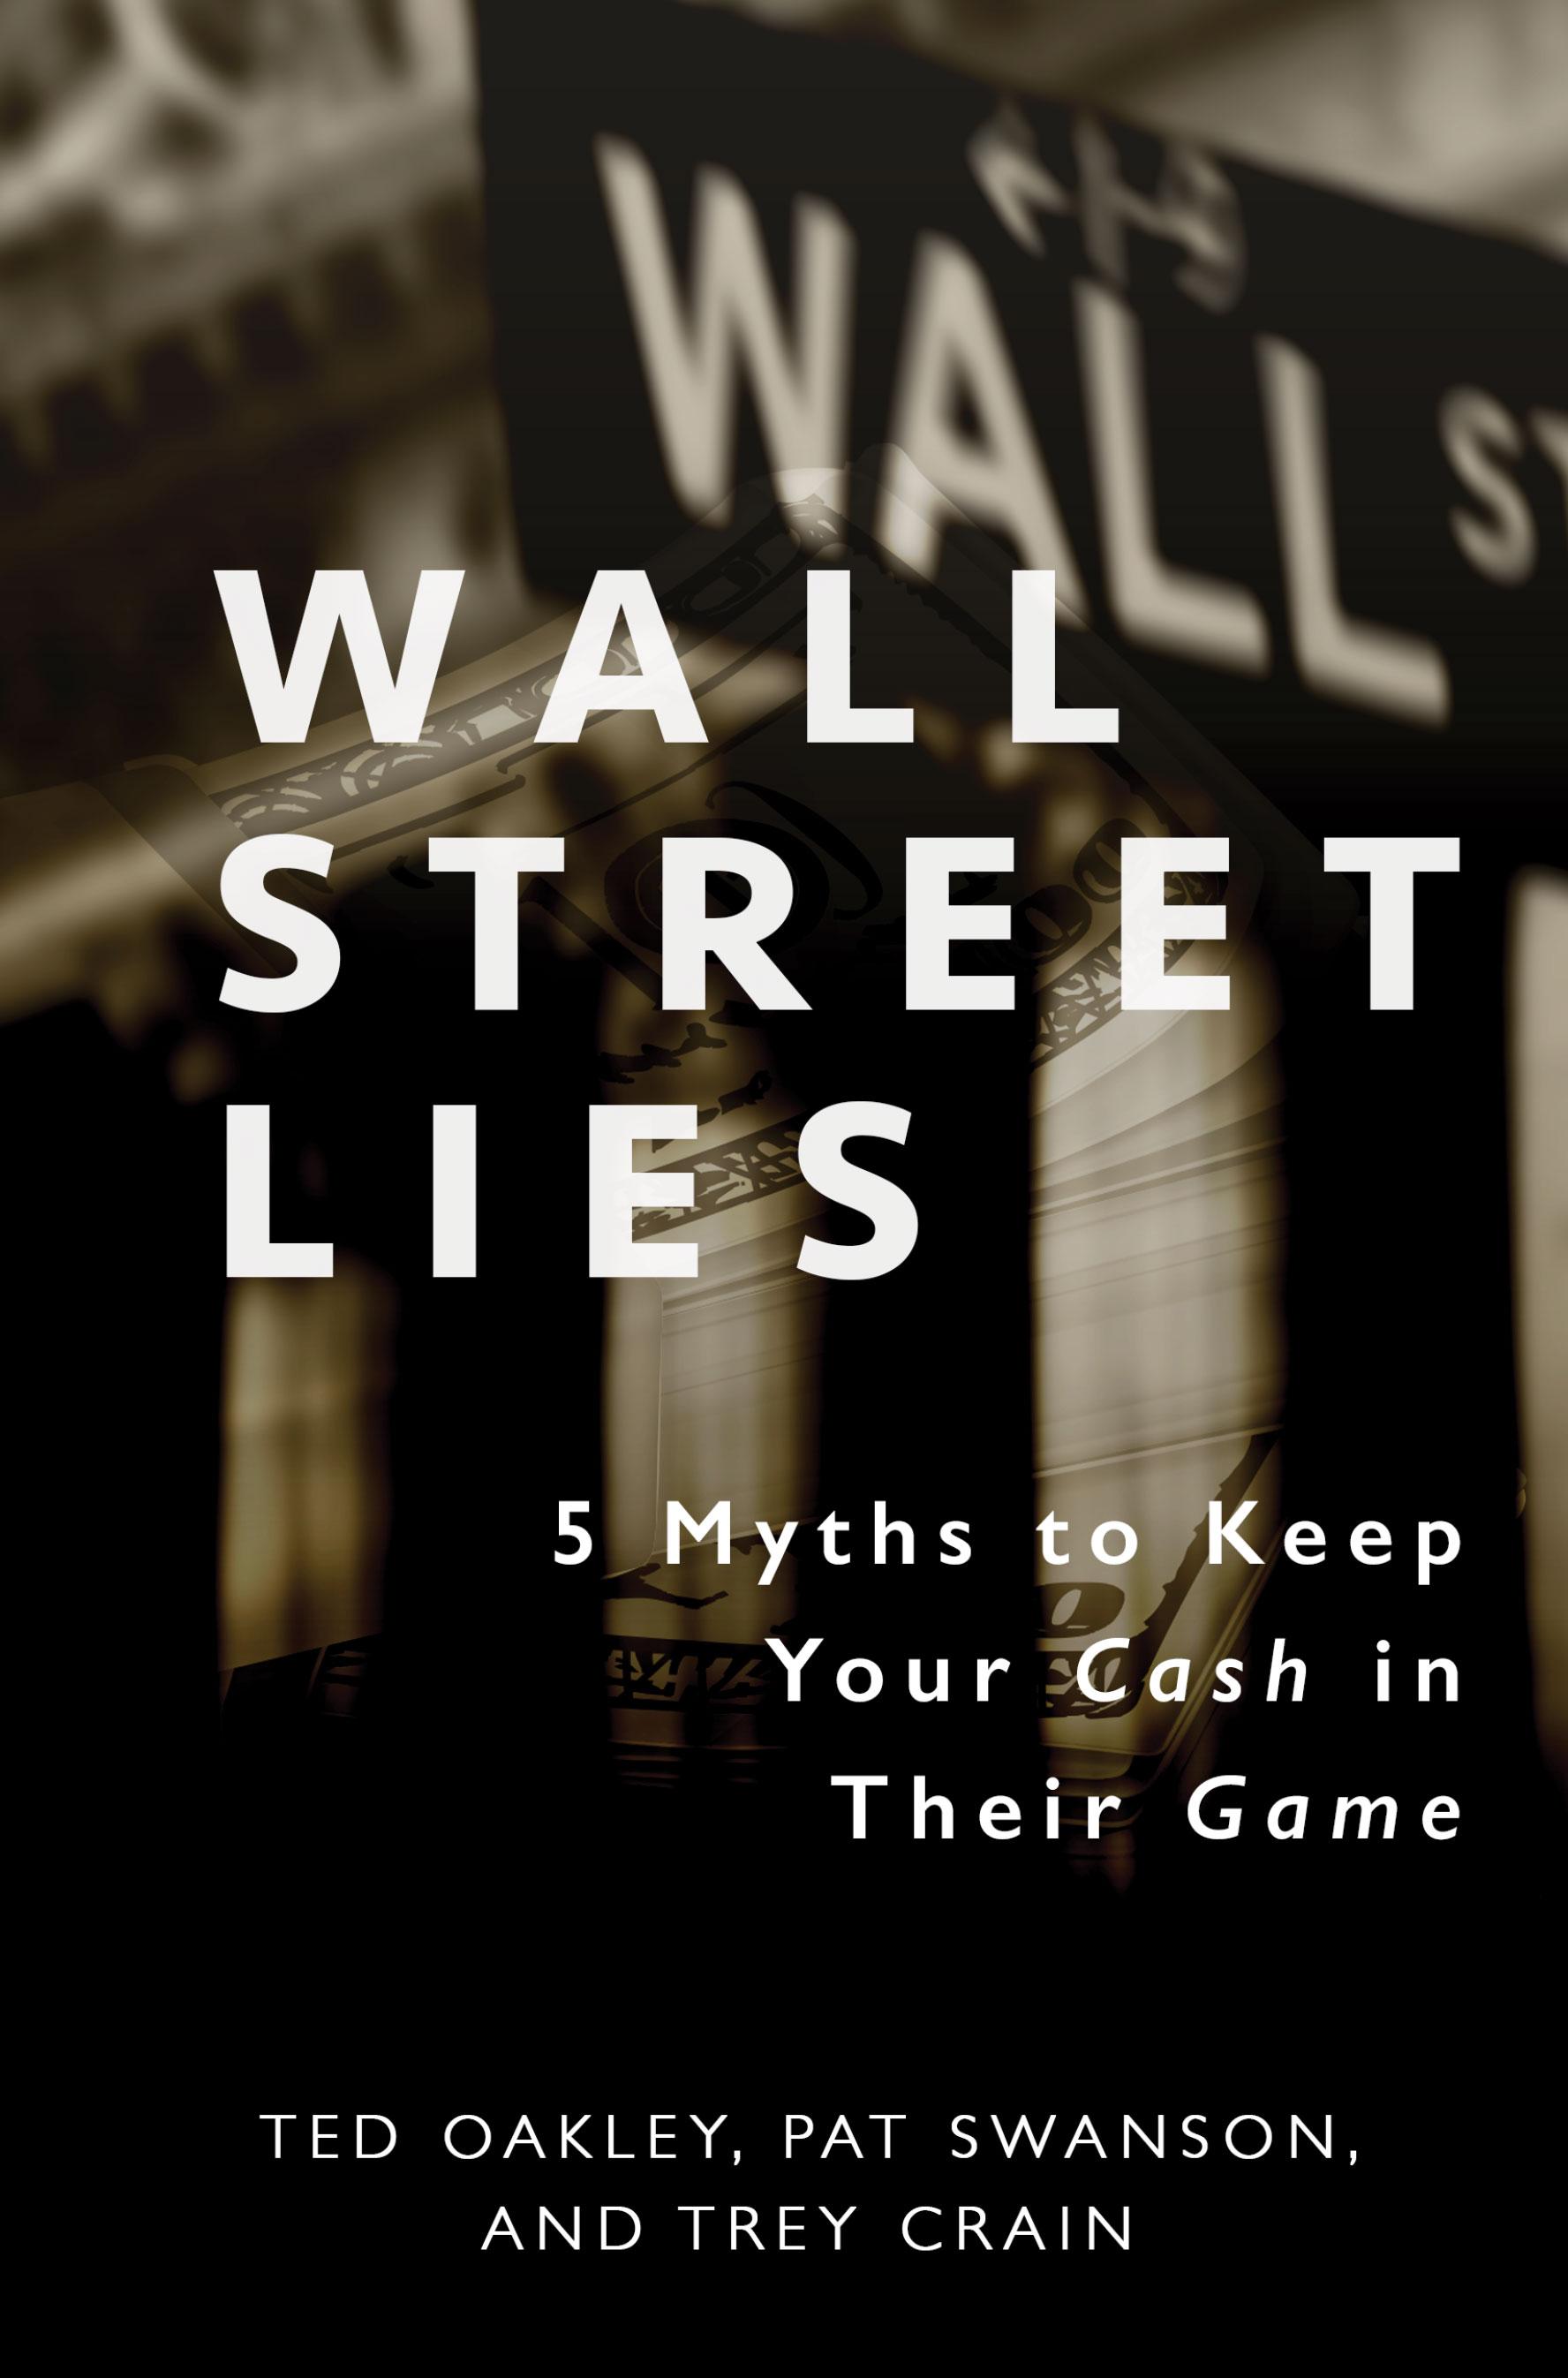 wall-street-lies-ted-oakley-oxbow-advisors